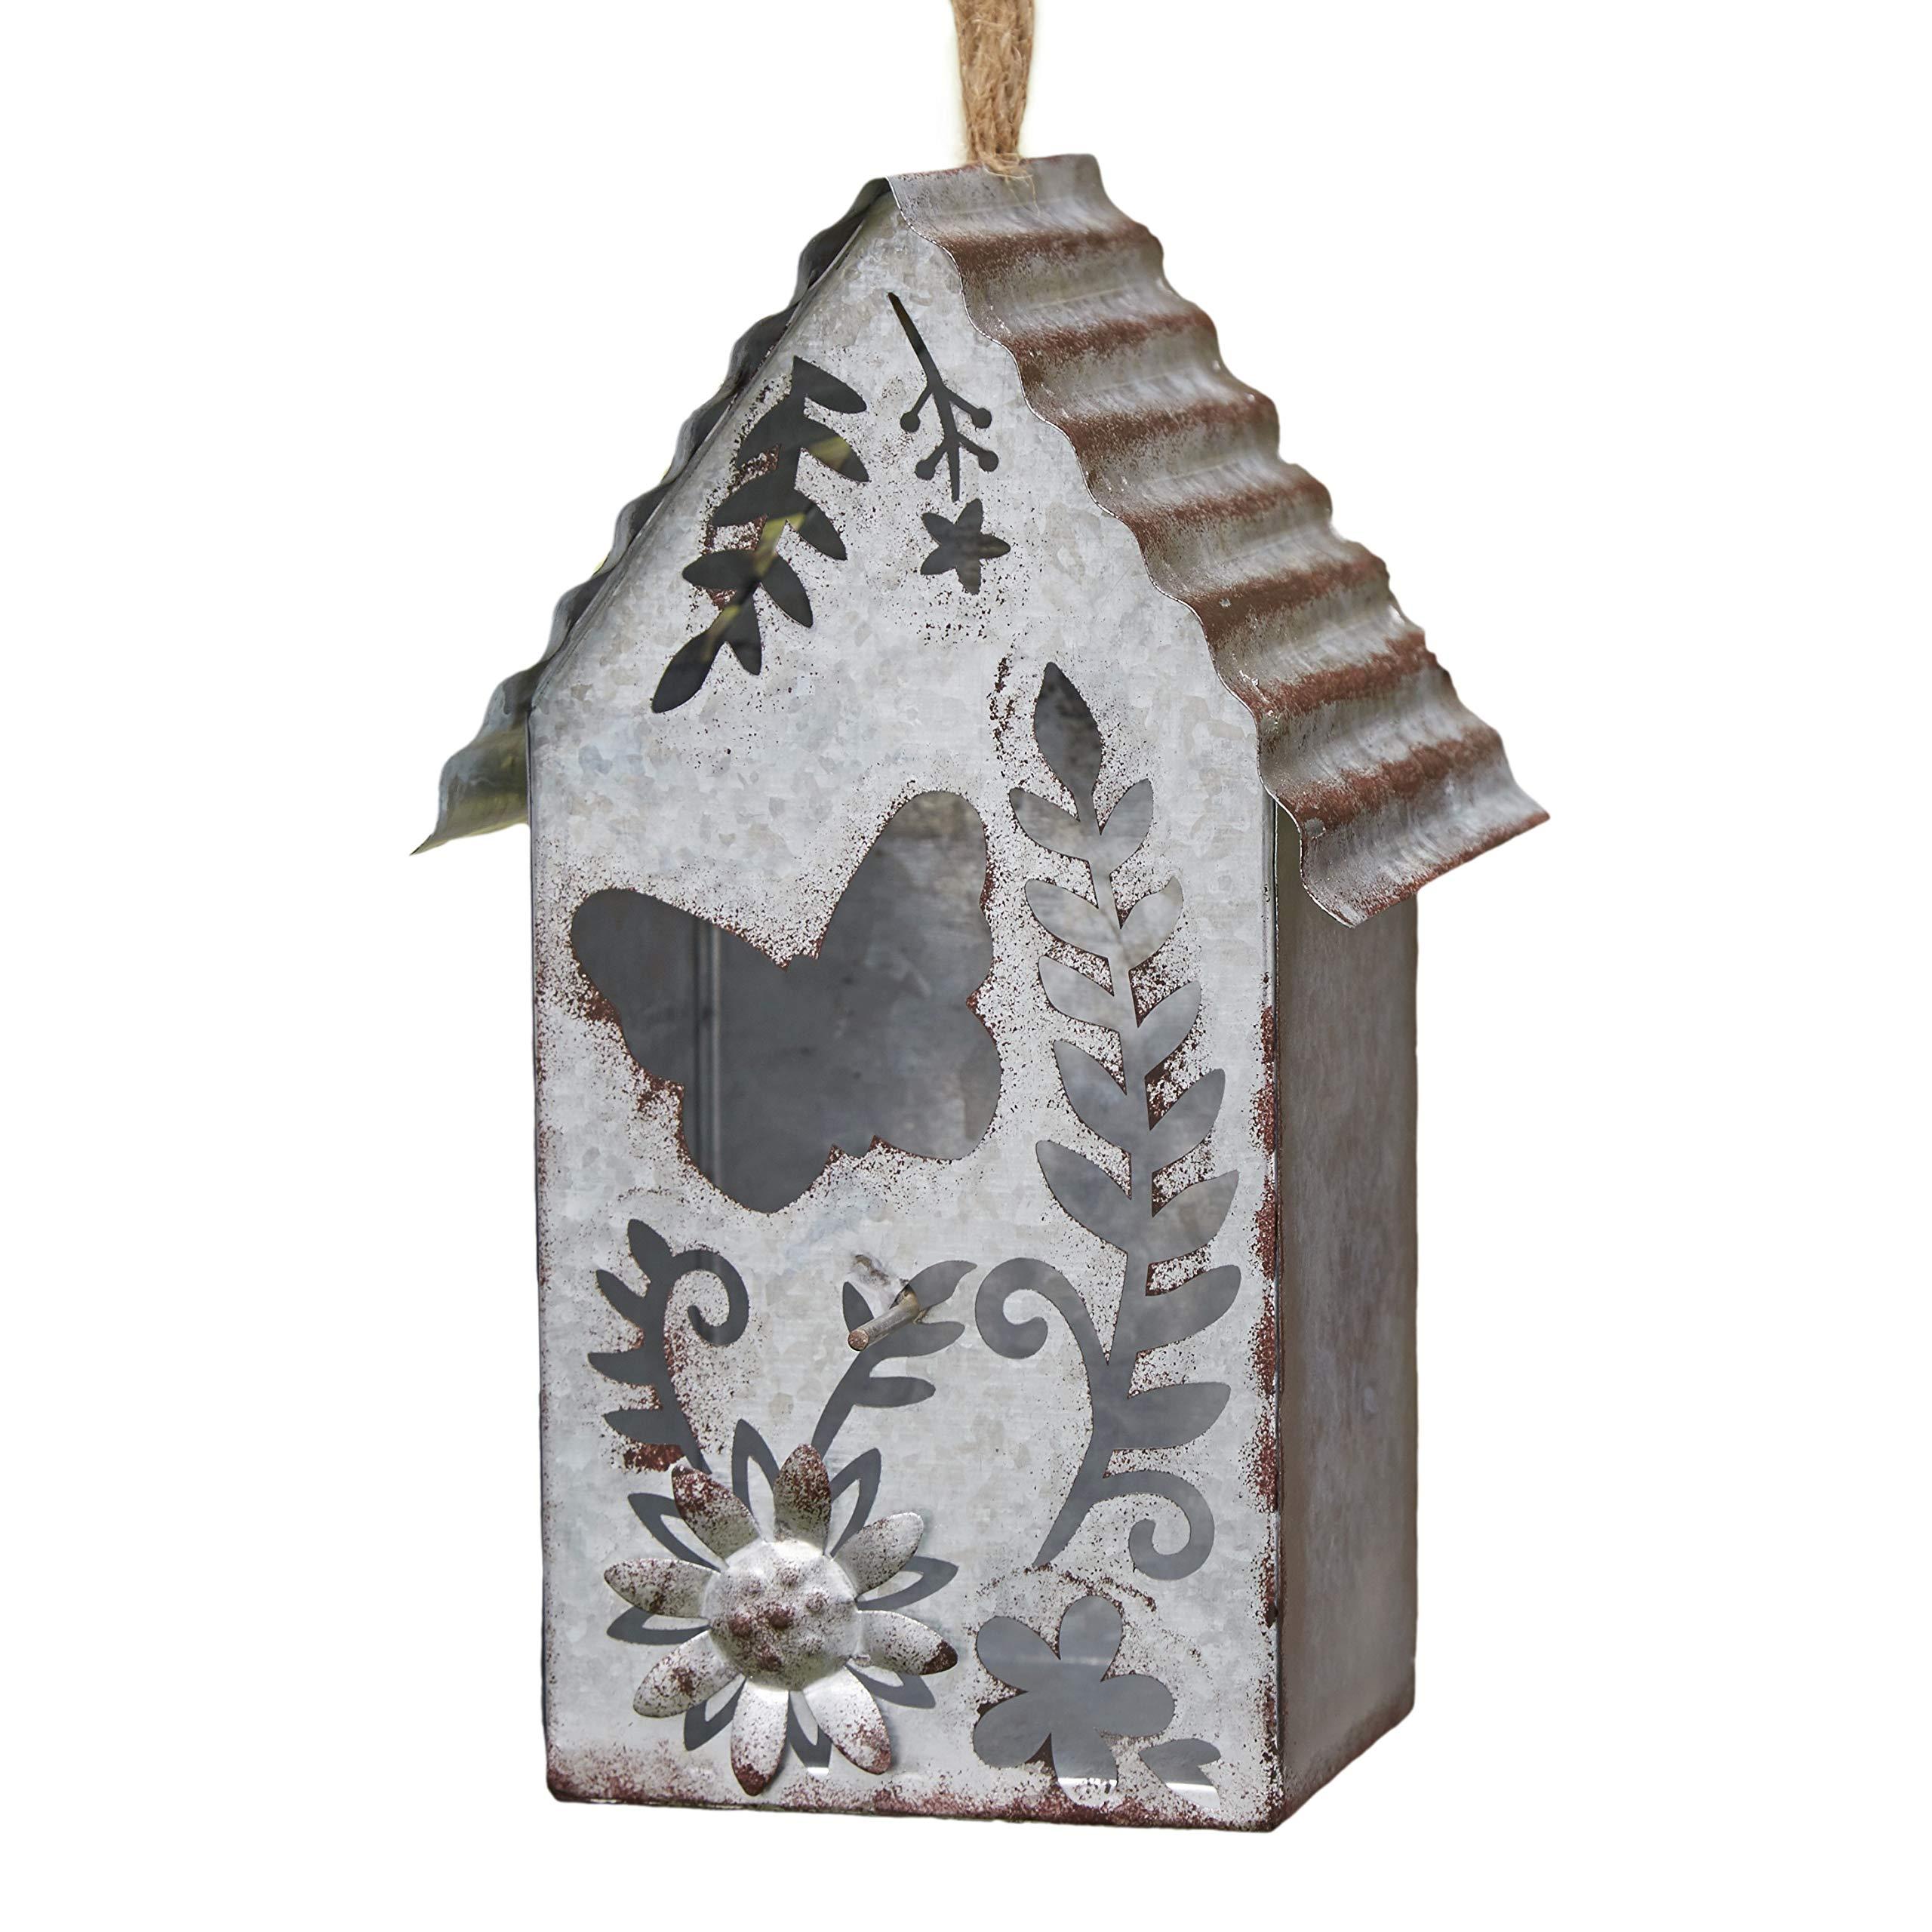 ALEX Toys Craft Home Tweet Home Birdhouse Kit